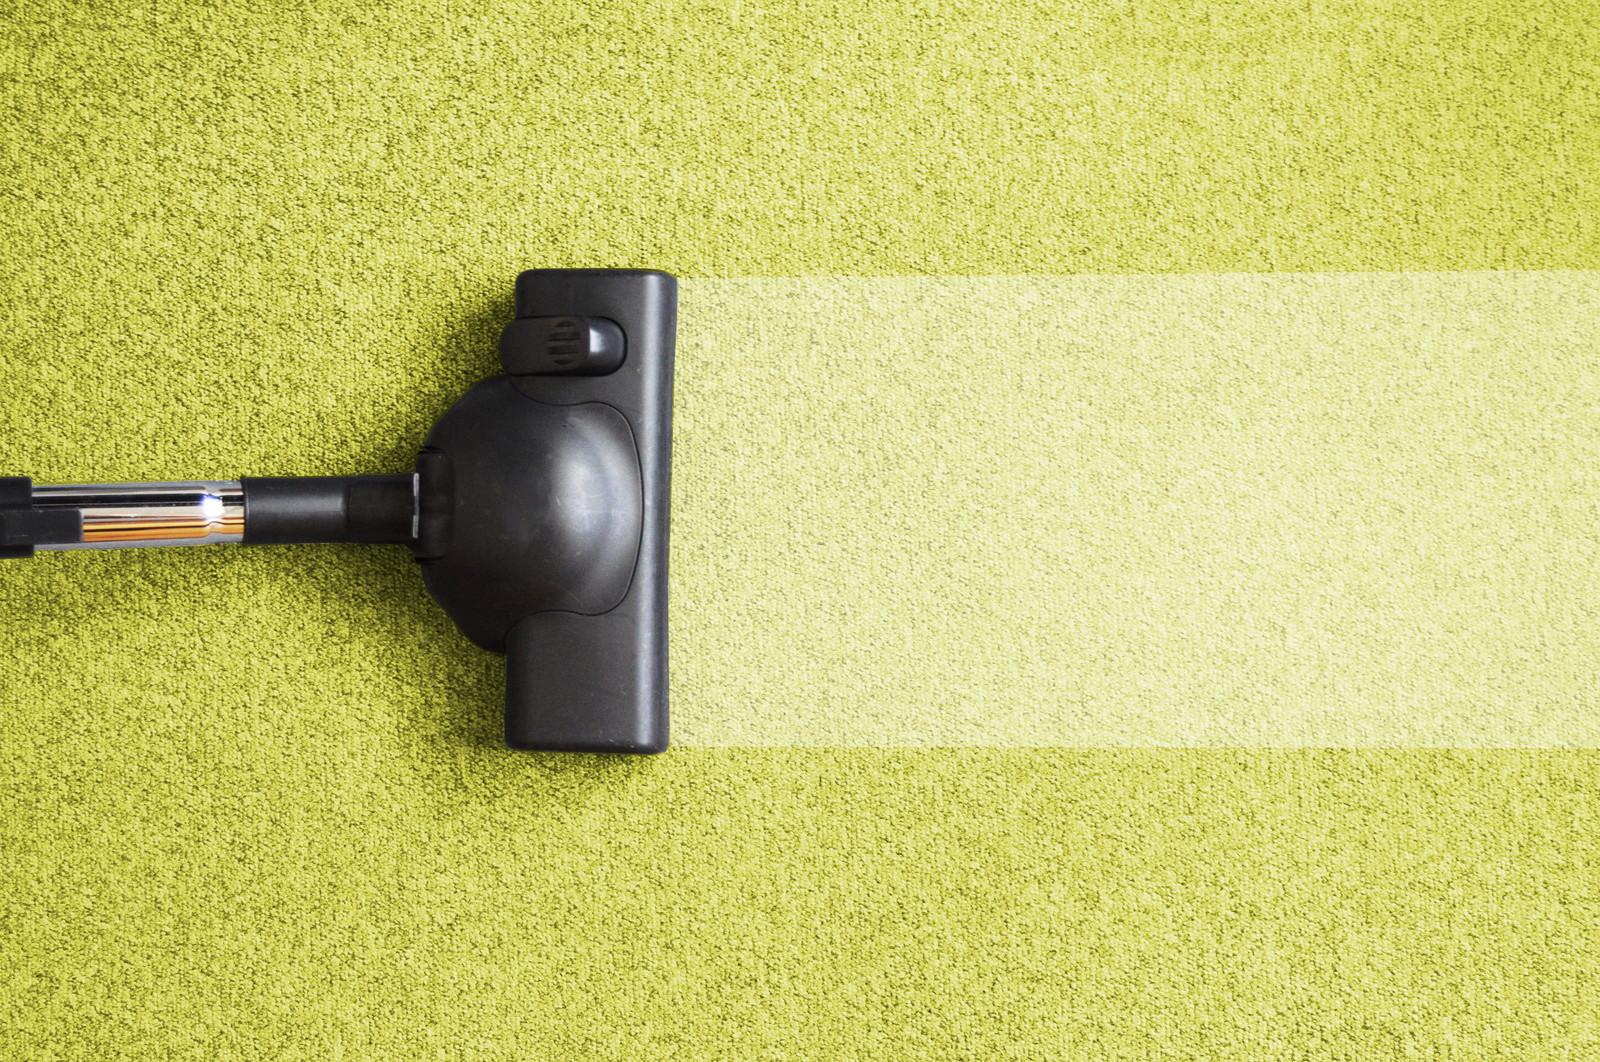 C mo limpiar alfombras correctamente blog de dia - Como limpiar alfombras ...